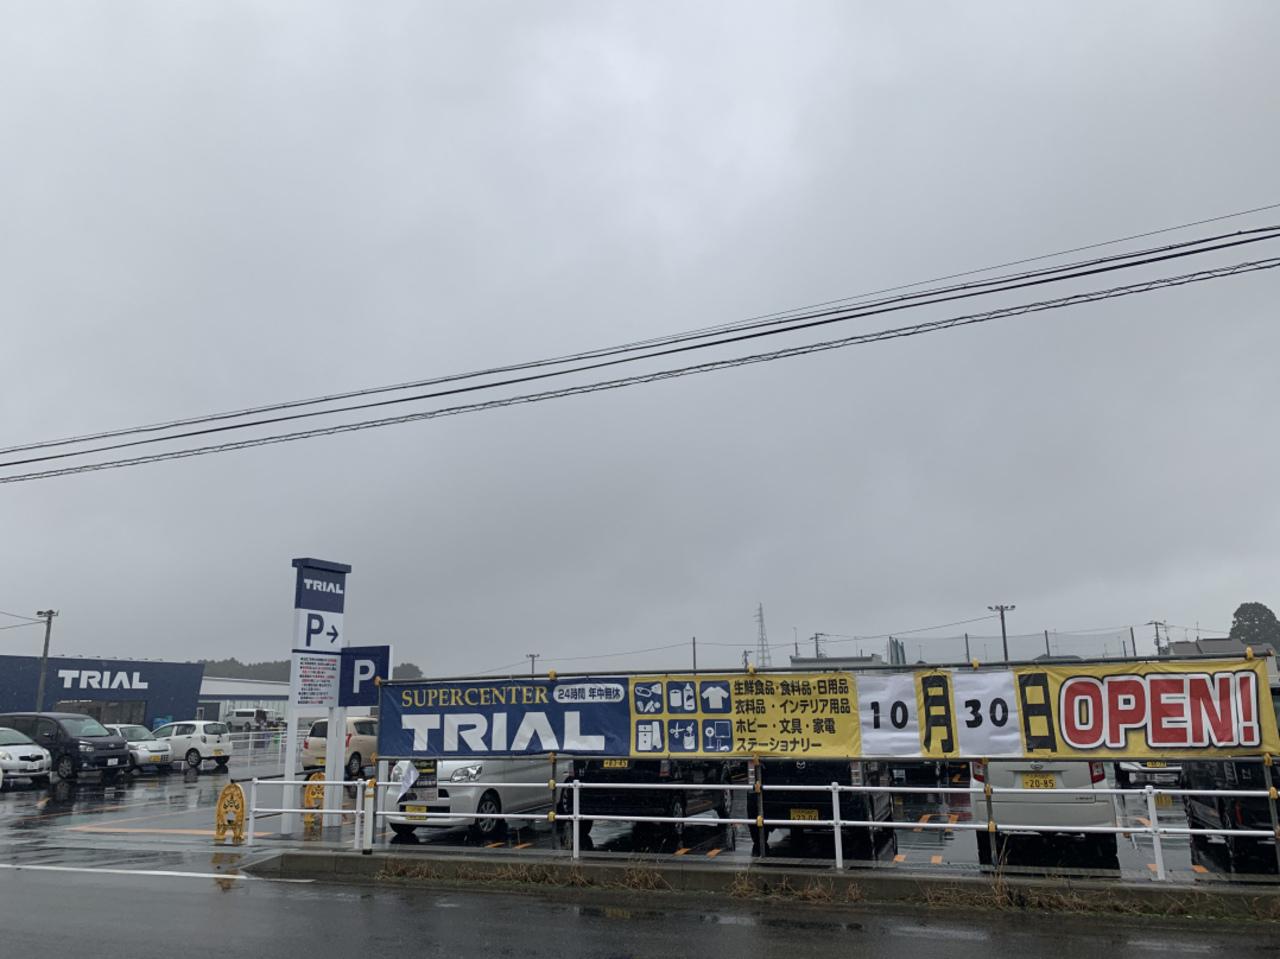 19.10.30 OPEN!24時間営業のディスカウントストア 「トライアル 十和田店」